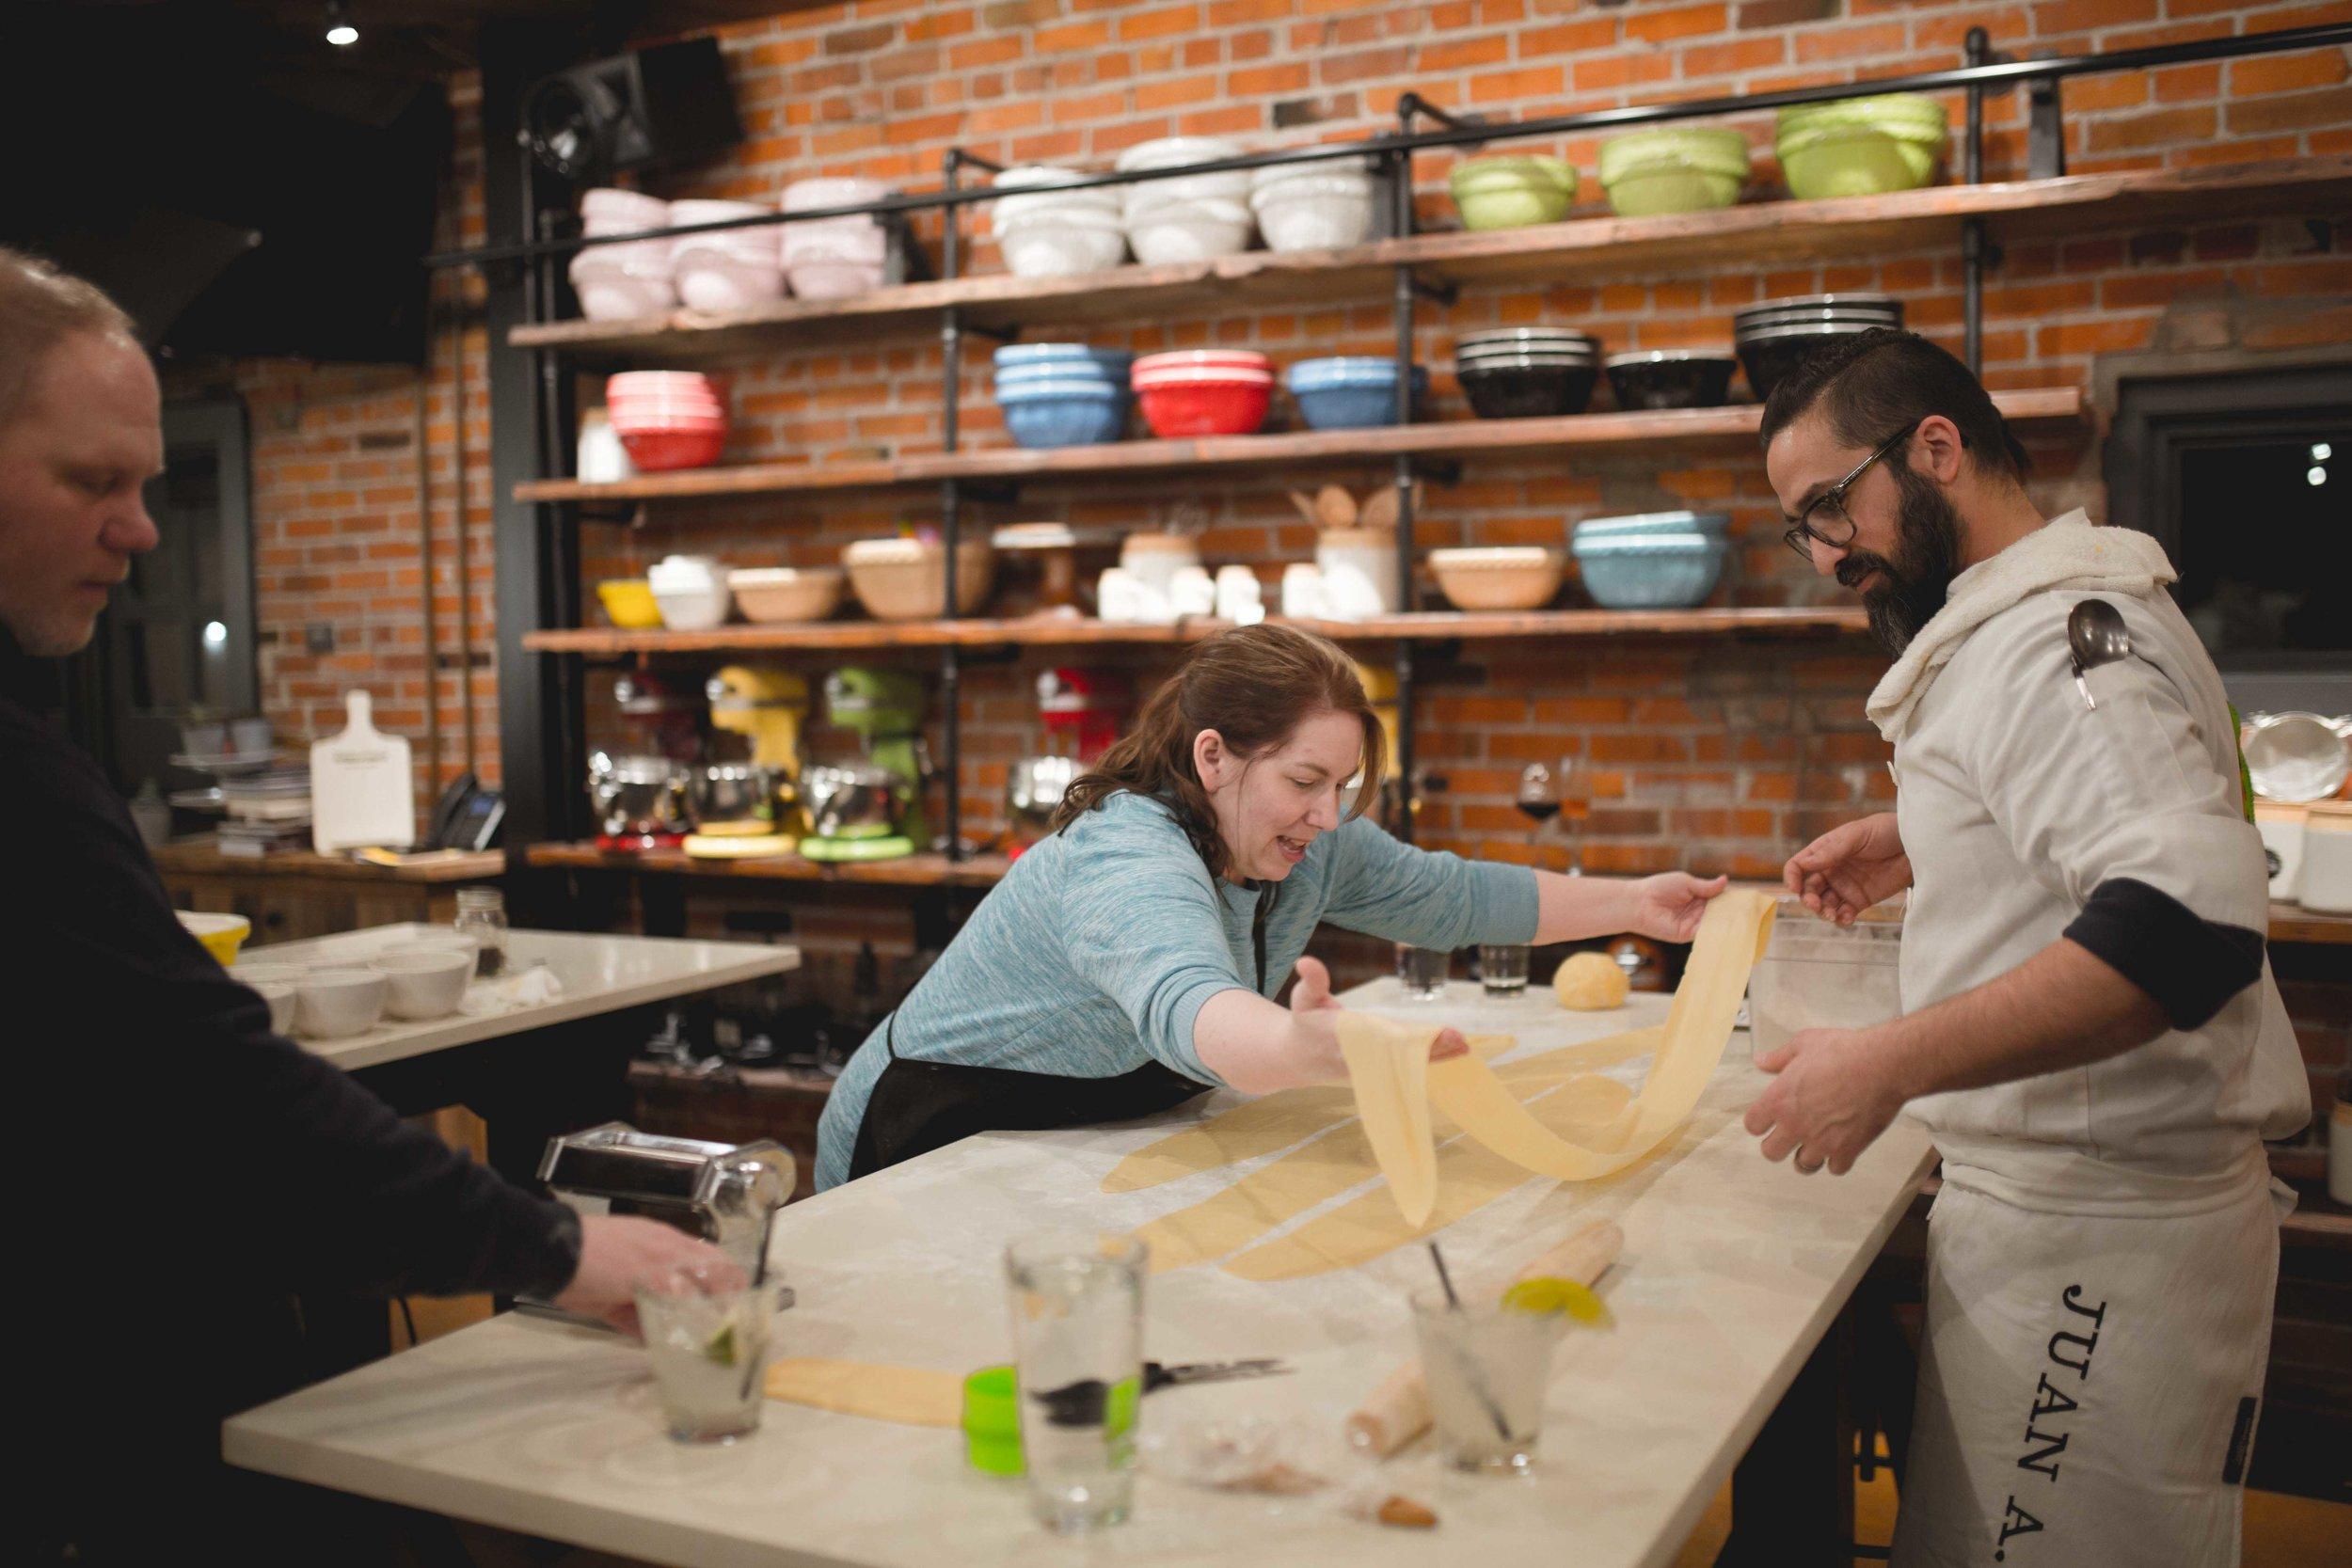 GingerandBaker-JuliyJuan-CookingClass-Feb28-67.jpg